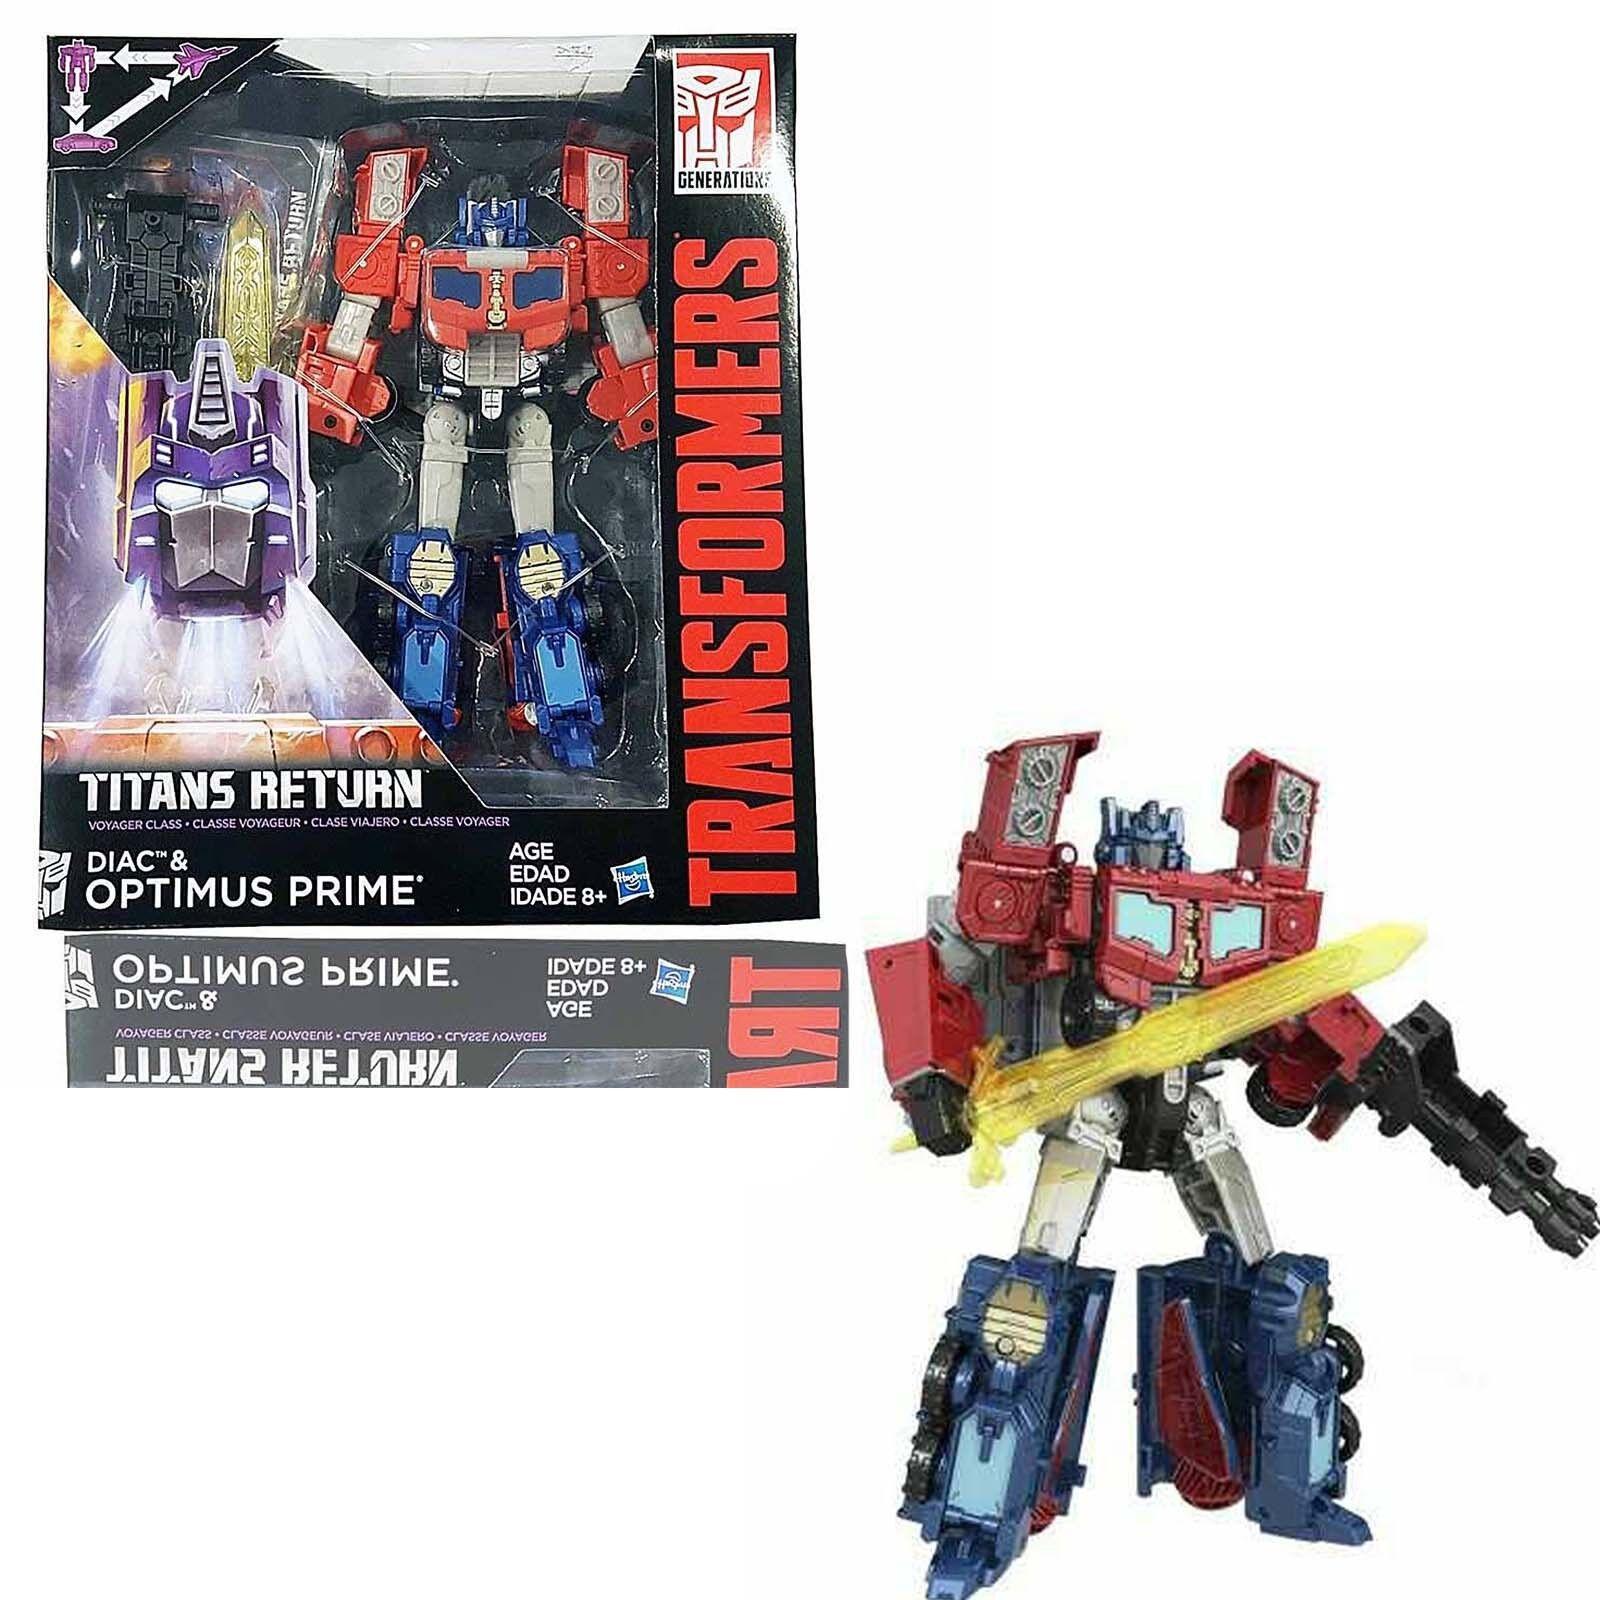 Transformers Generations Titans Return DIAC & OPTIMUS PRIME Voyager class Action